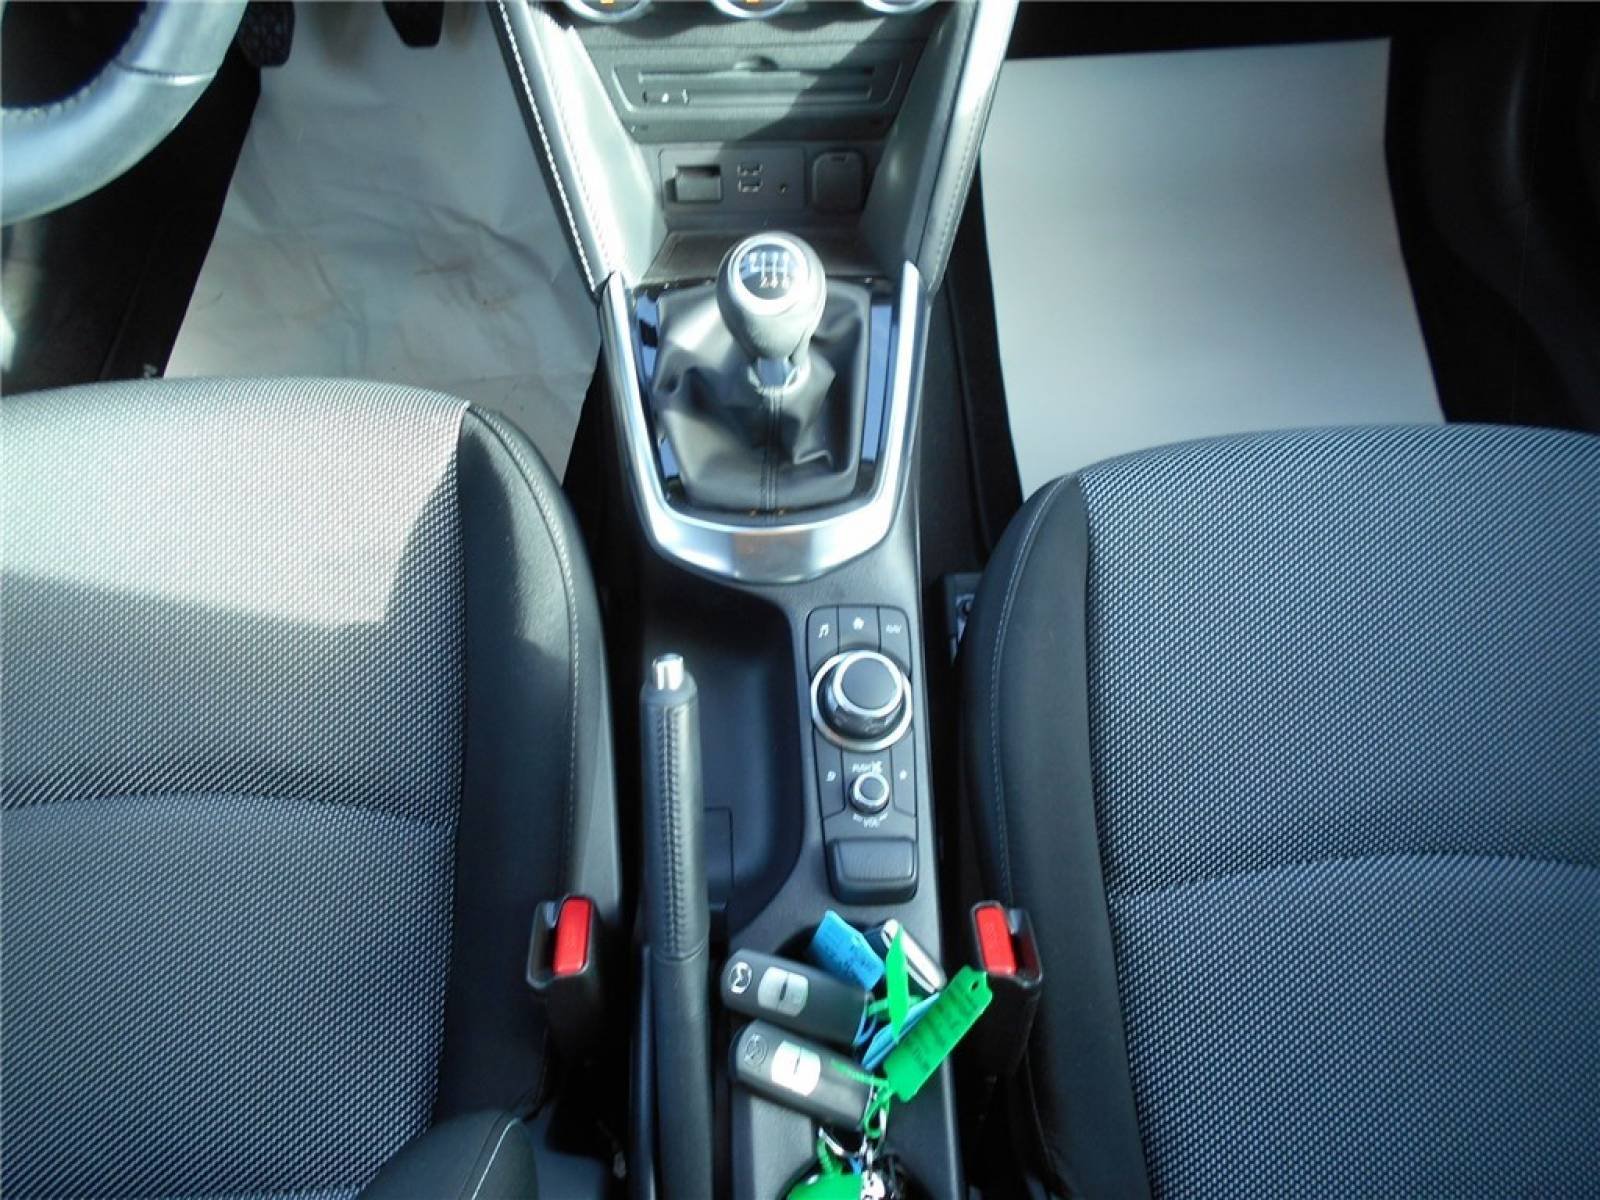 MAZDA Mazda2 1.5L SKYACTIV-G 115ch - véhicule d'occasion - Groupe Guillet - Chalon Automobiles - 71100 - Chalon-sur-Saône - 31